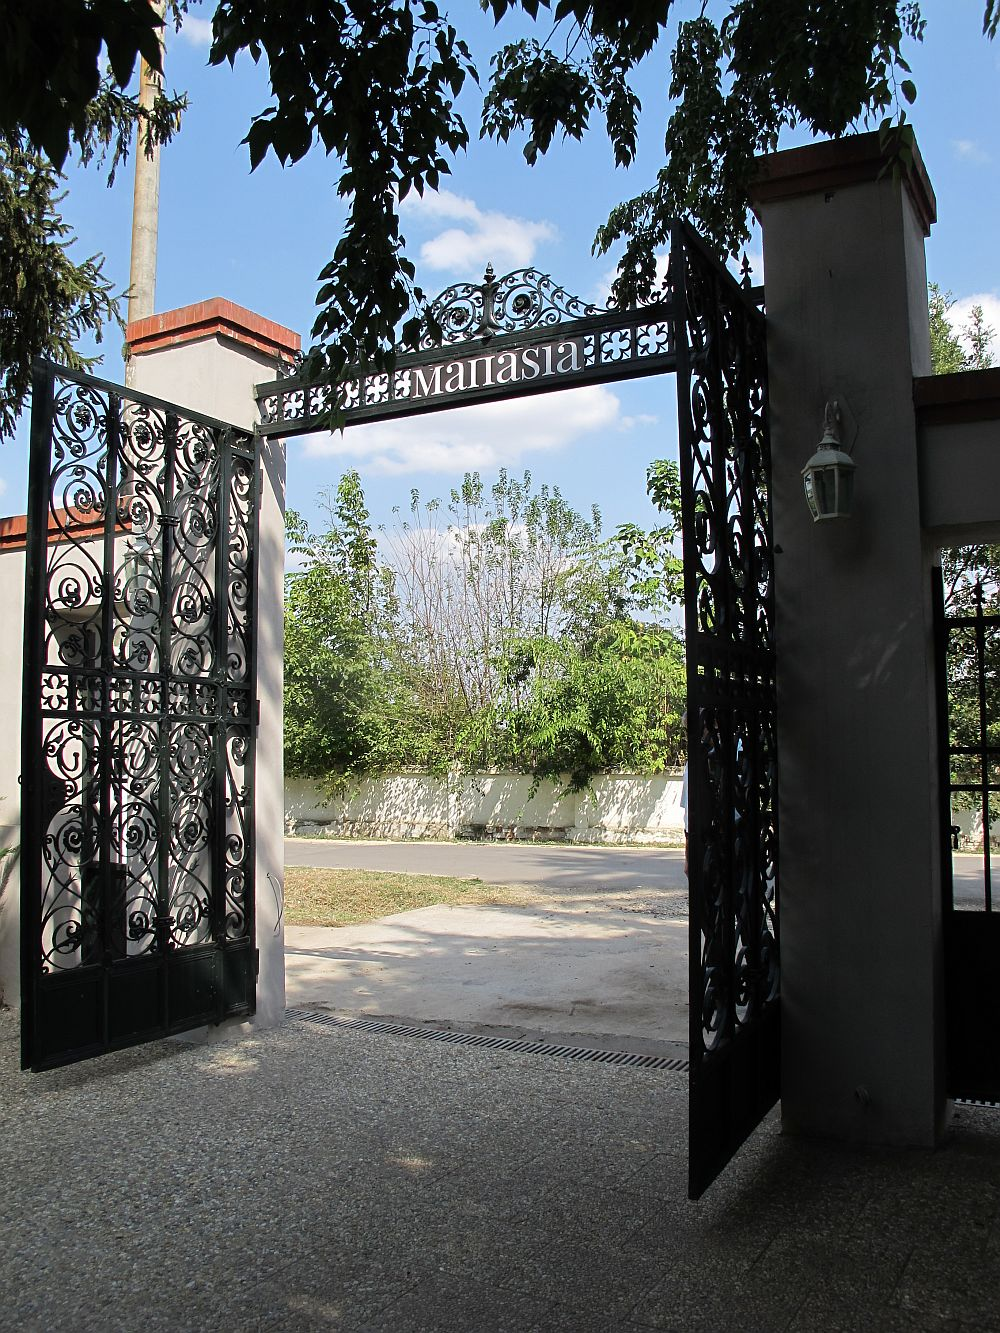 adelaparvu.com despre Domeniu Manasia, Urziceni, Romania (67)